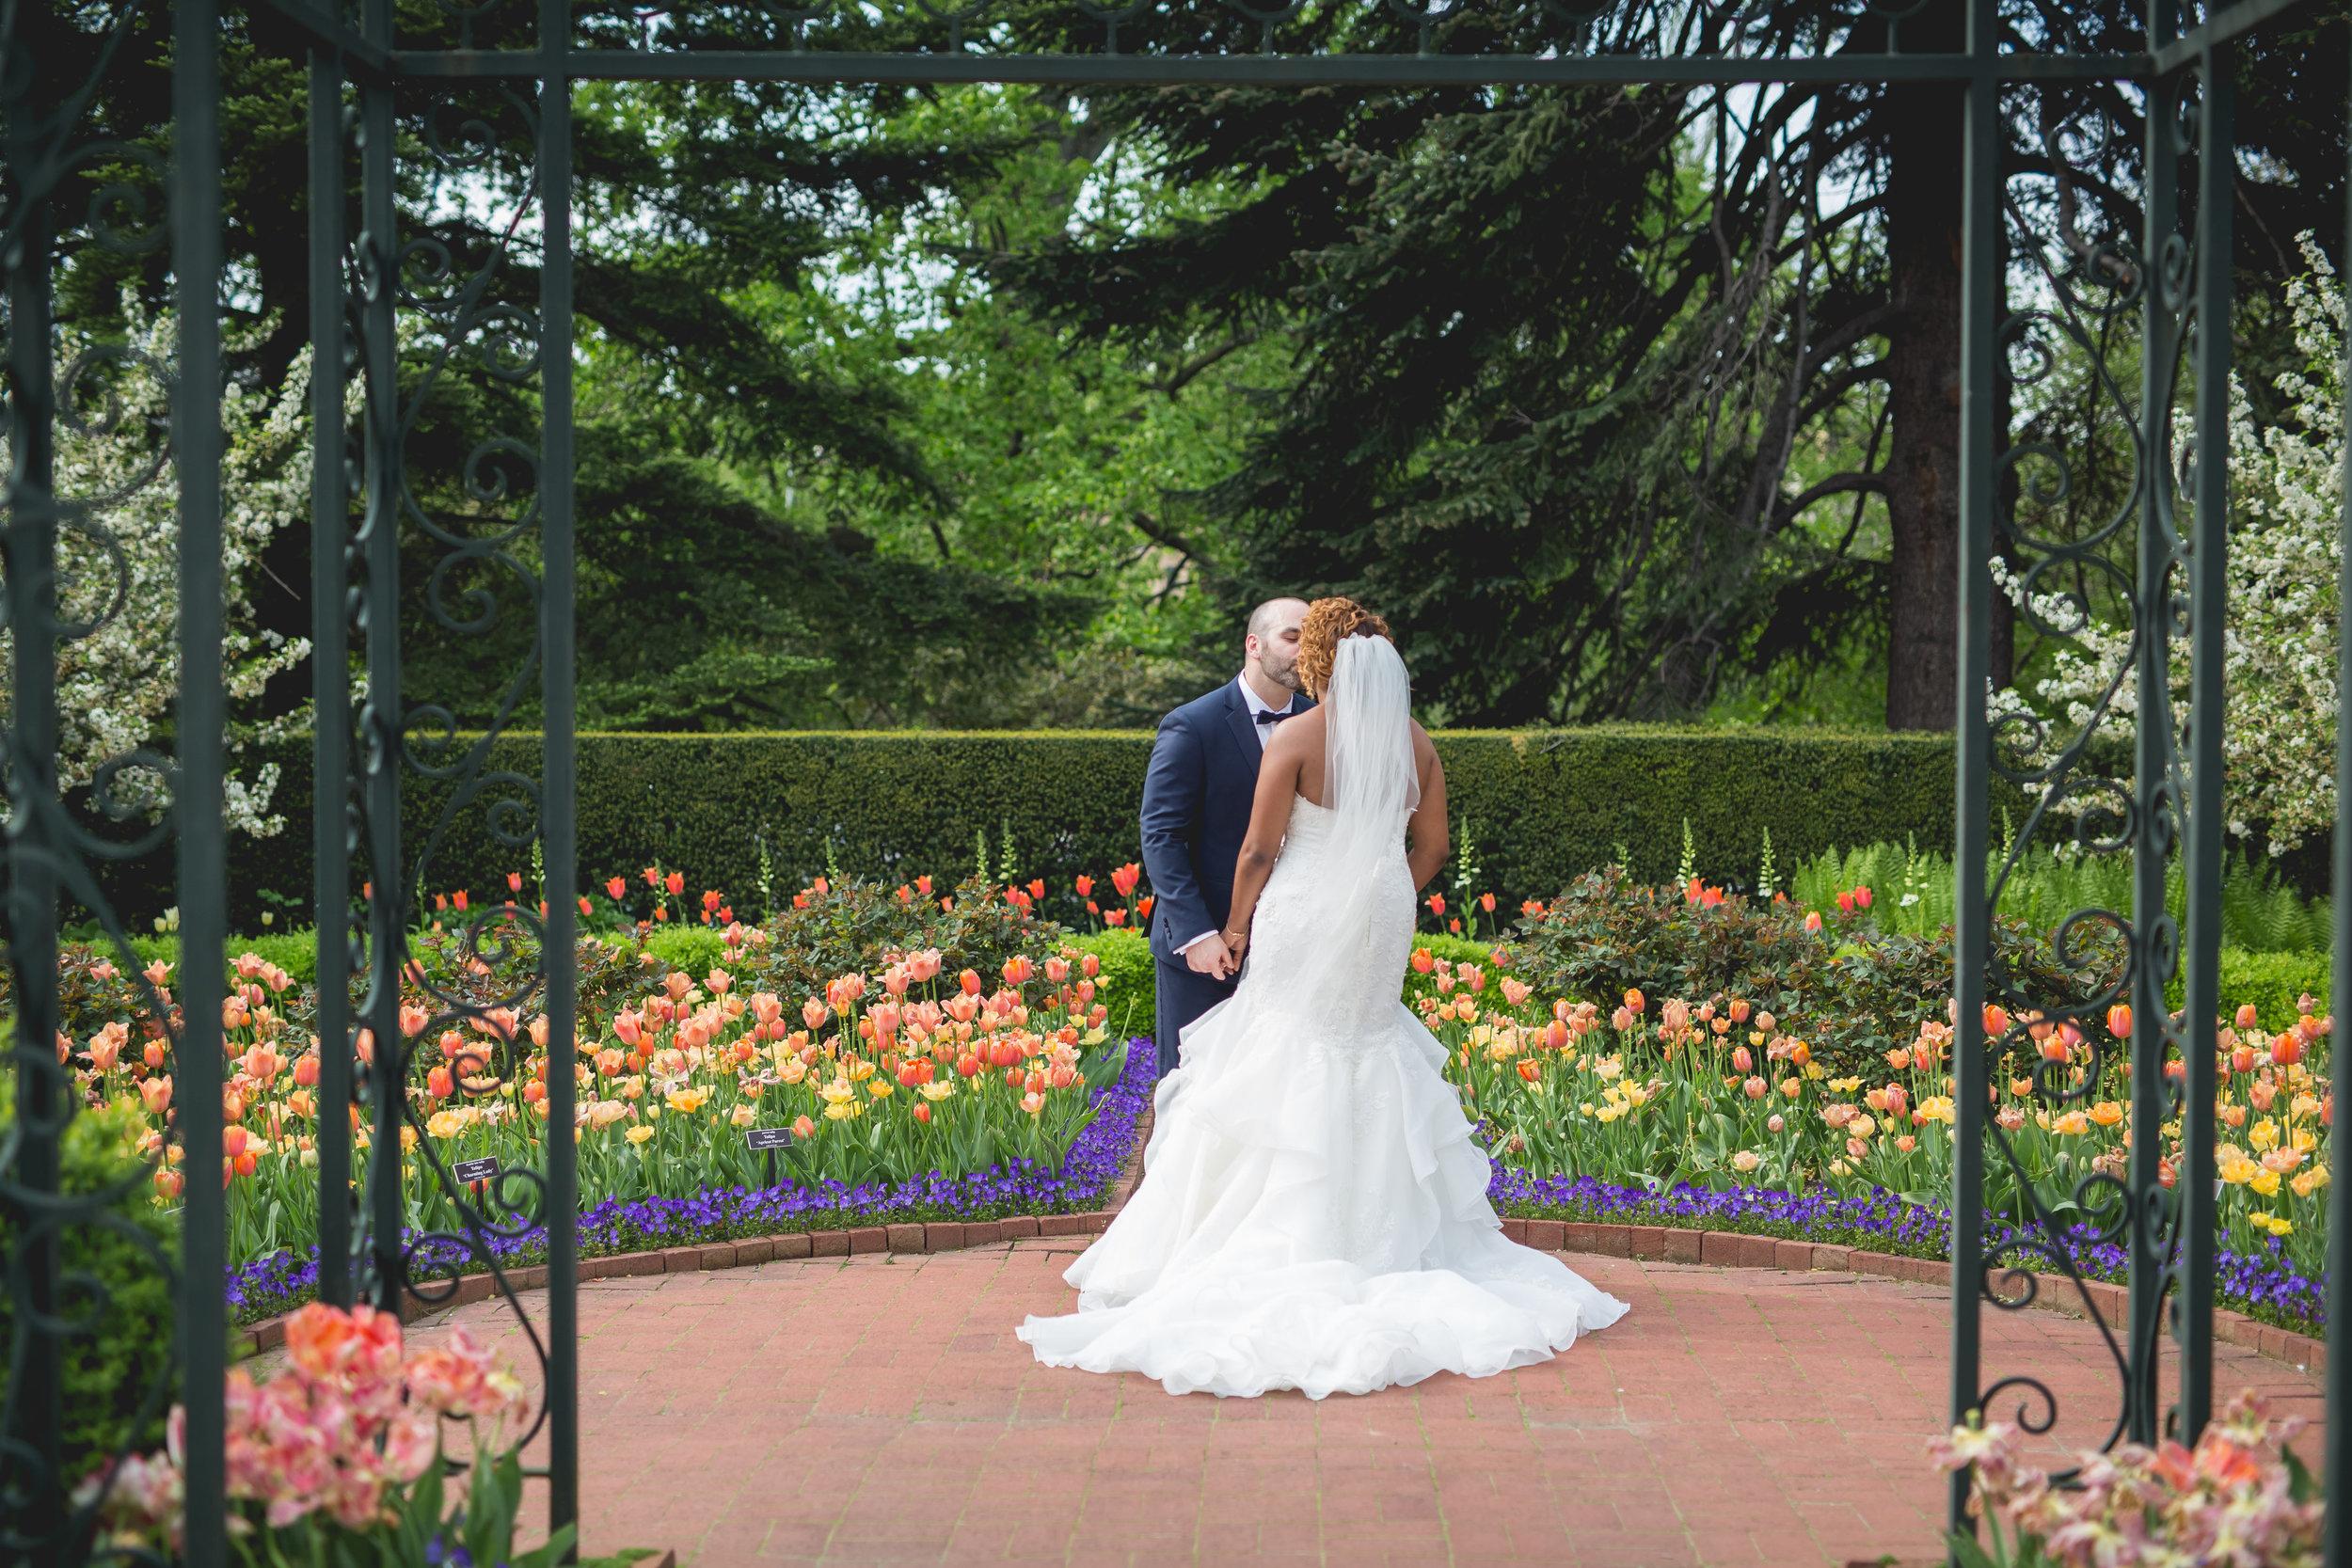 First look in the tulip garden. Photo by Heartfelt Studios.